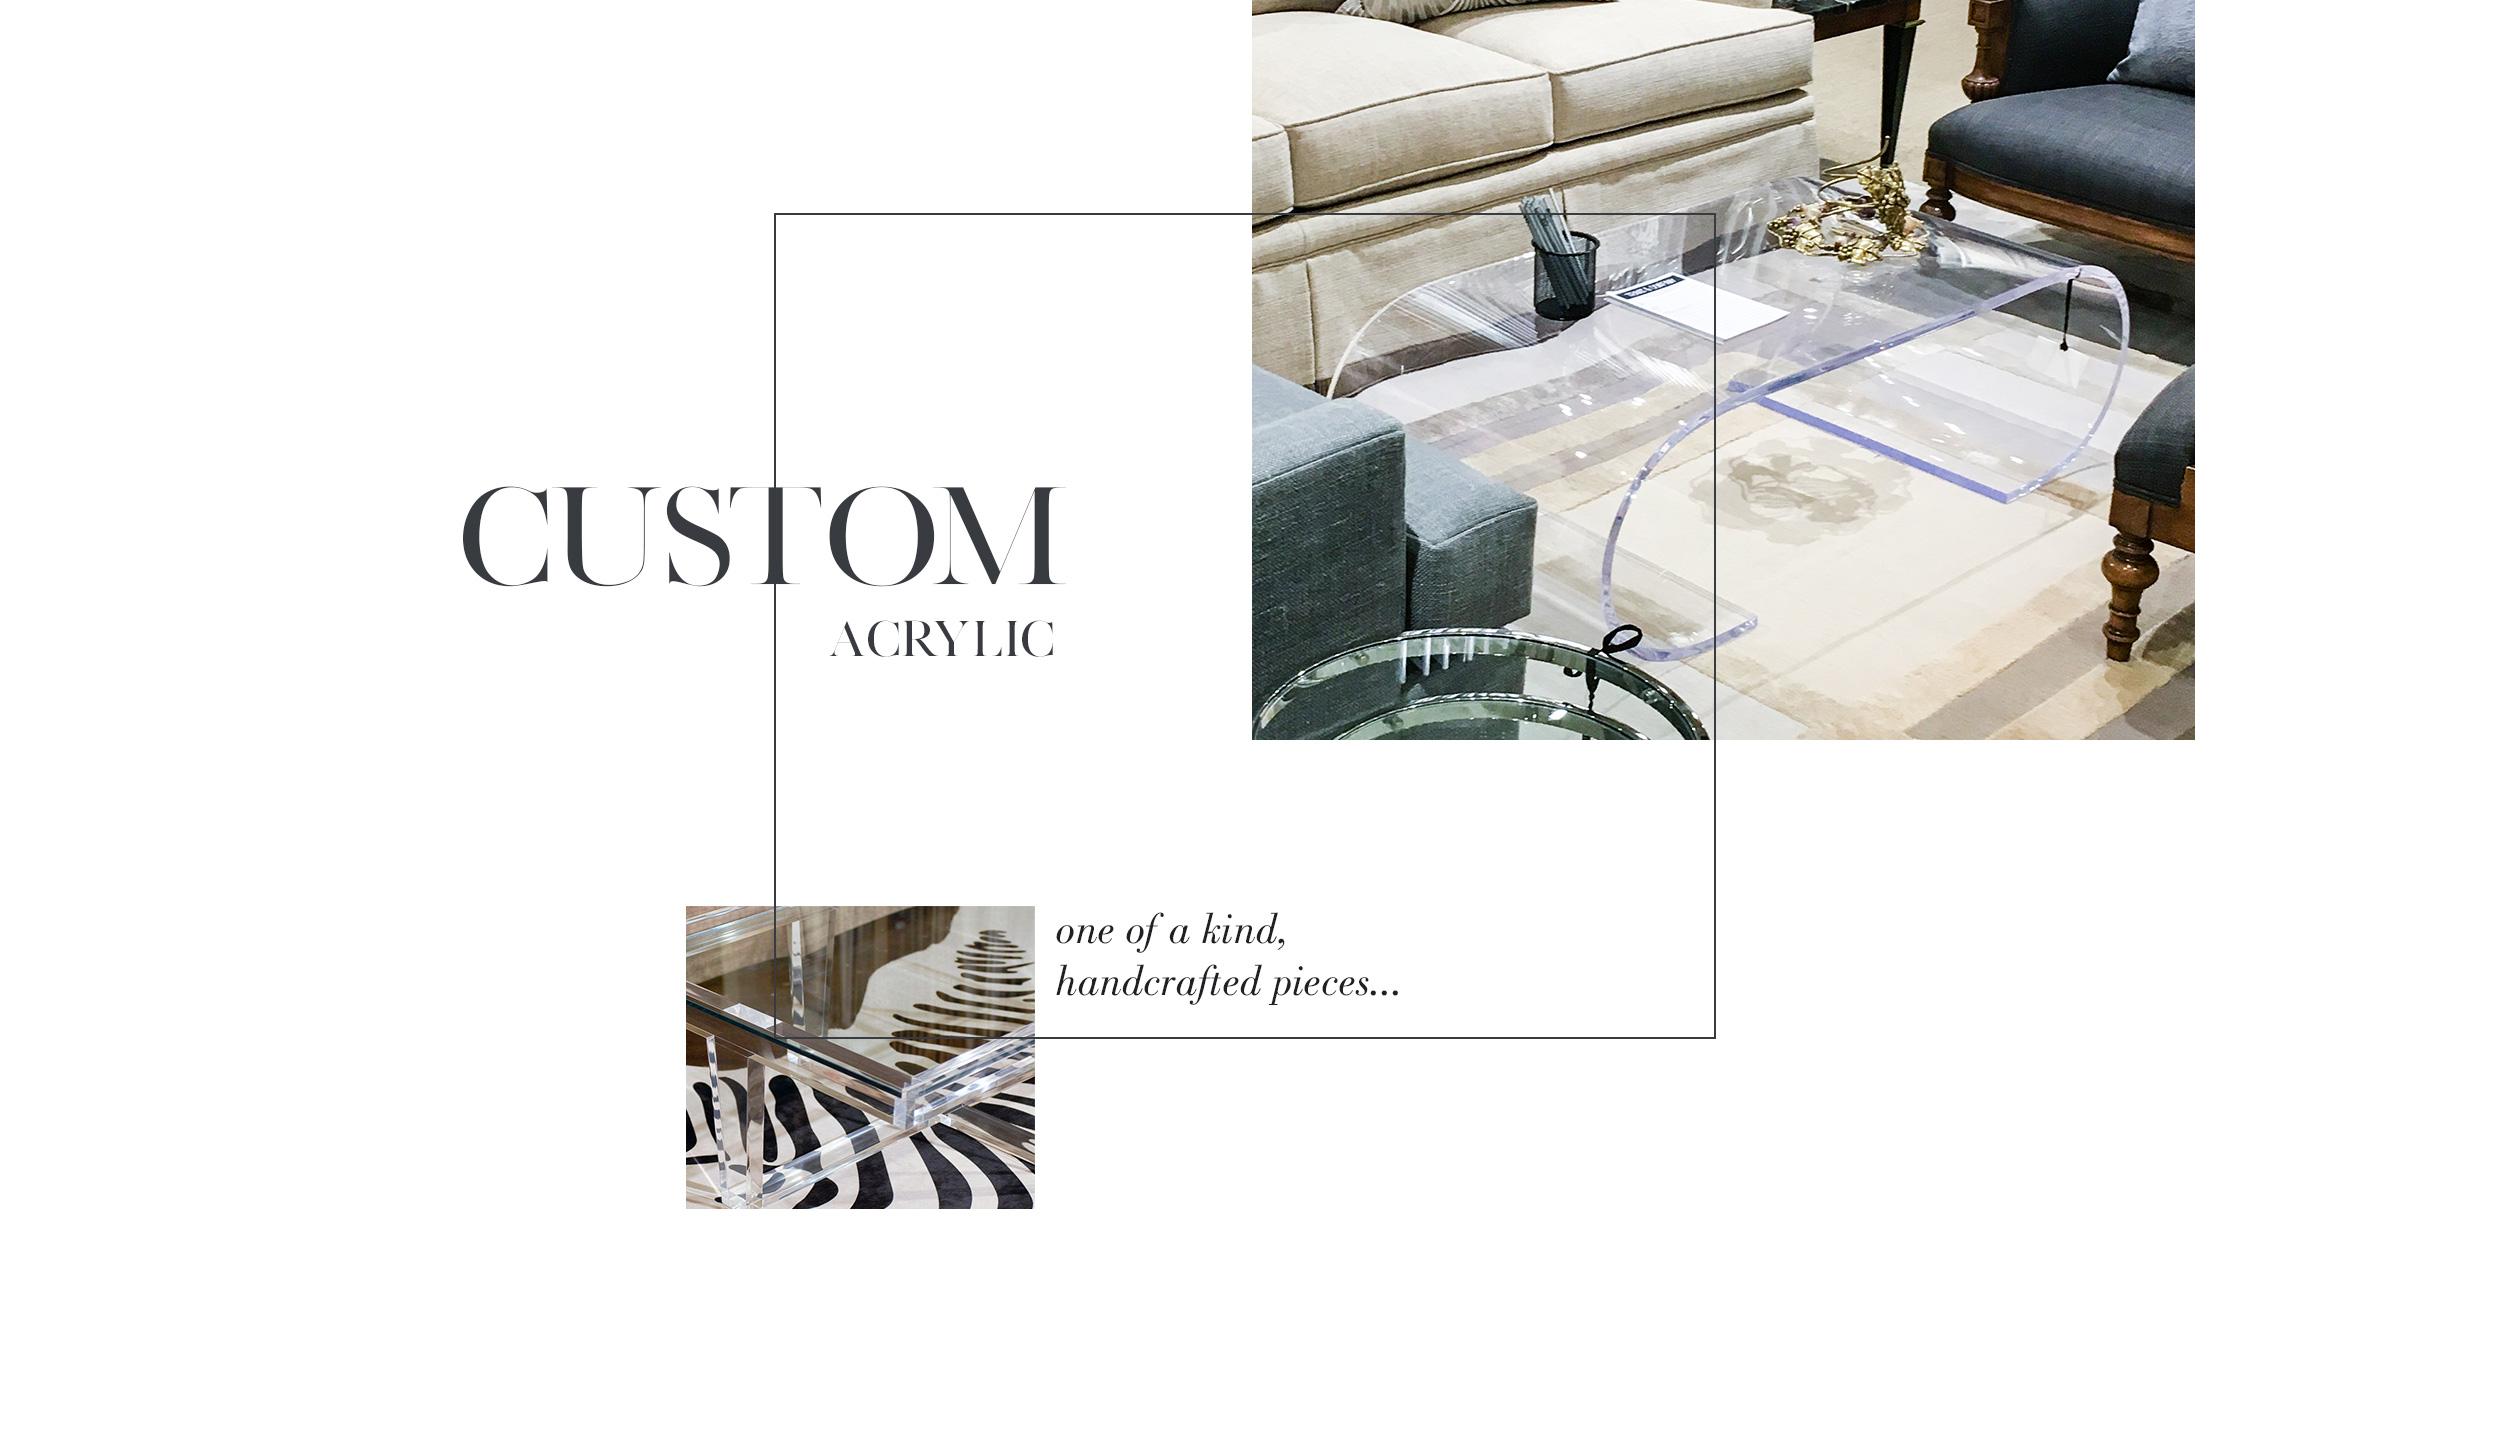 custom-acrylic.jpg